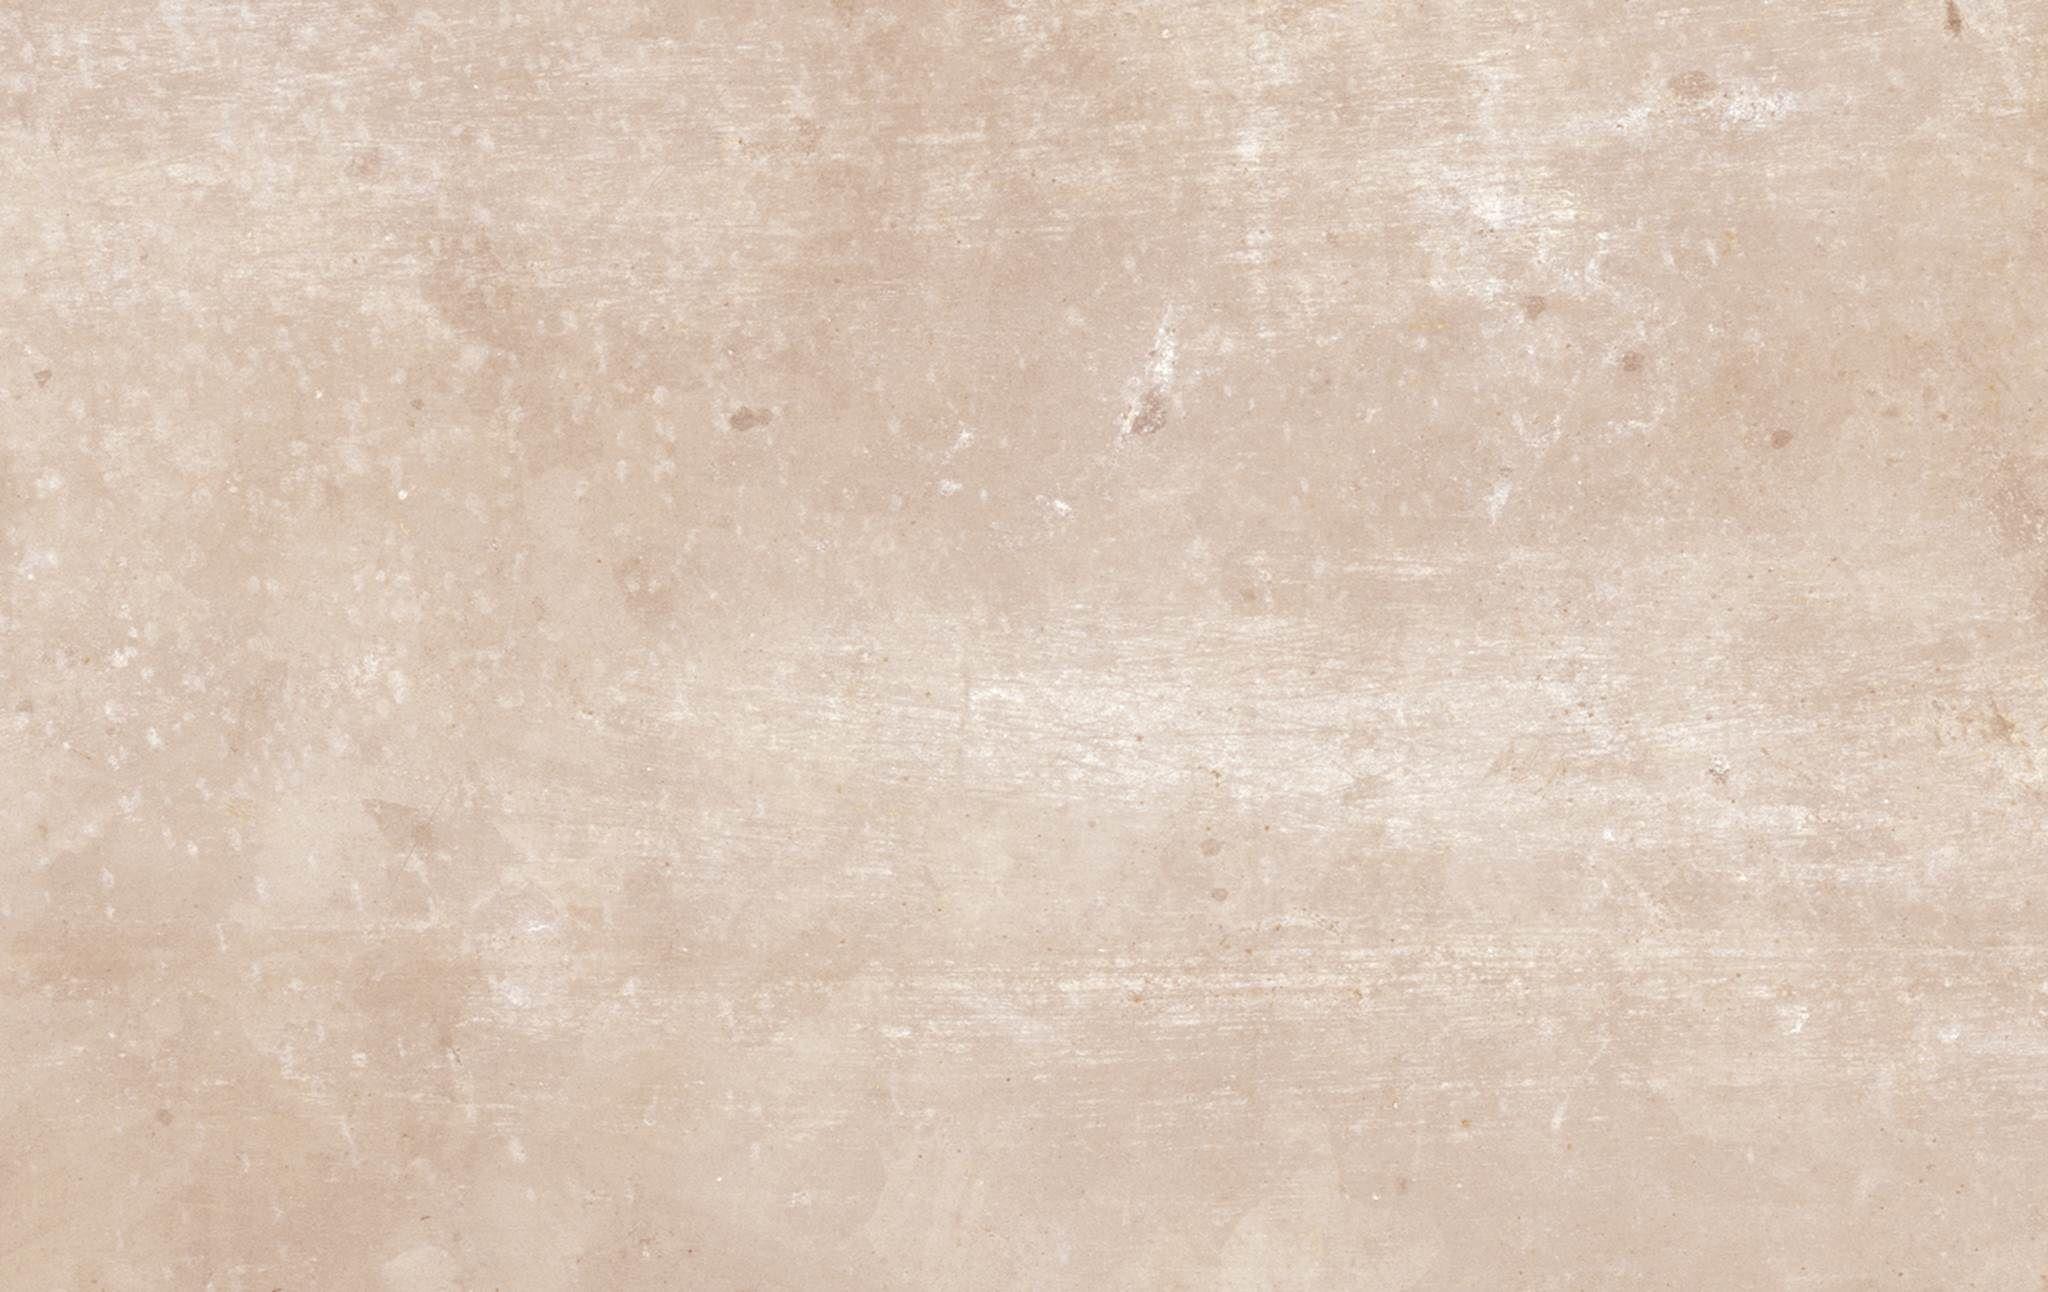 Faience salle de bain cifre serie lamina 25x40 1 choix for Choix carrelage